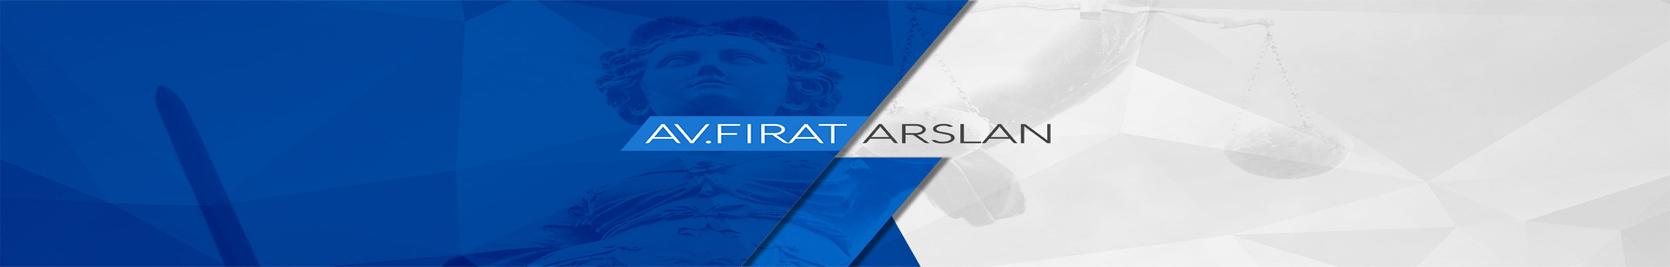 firat-arslan-title-background